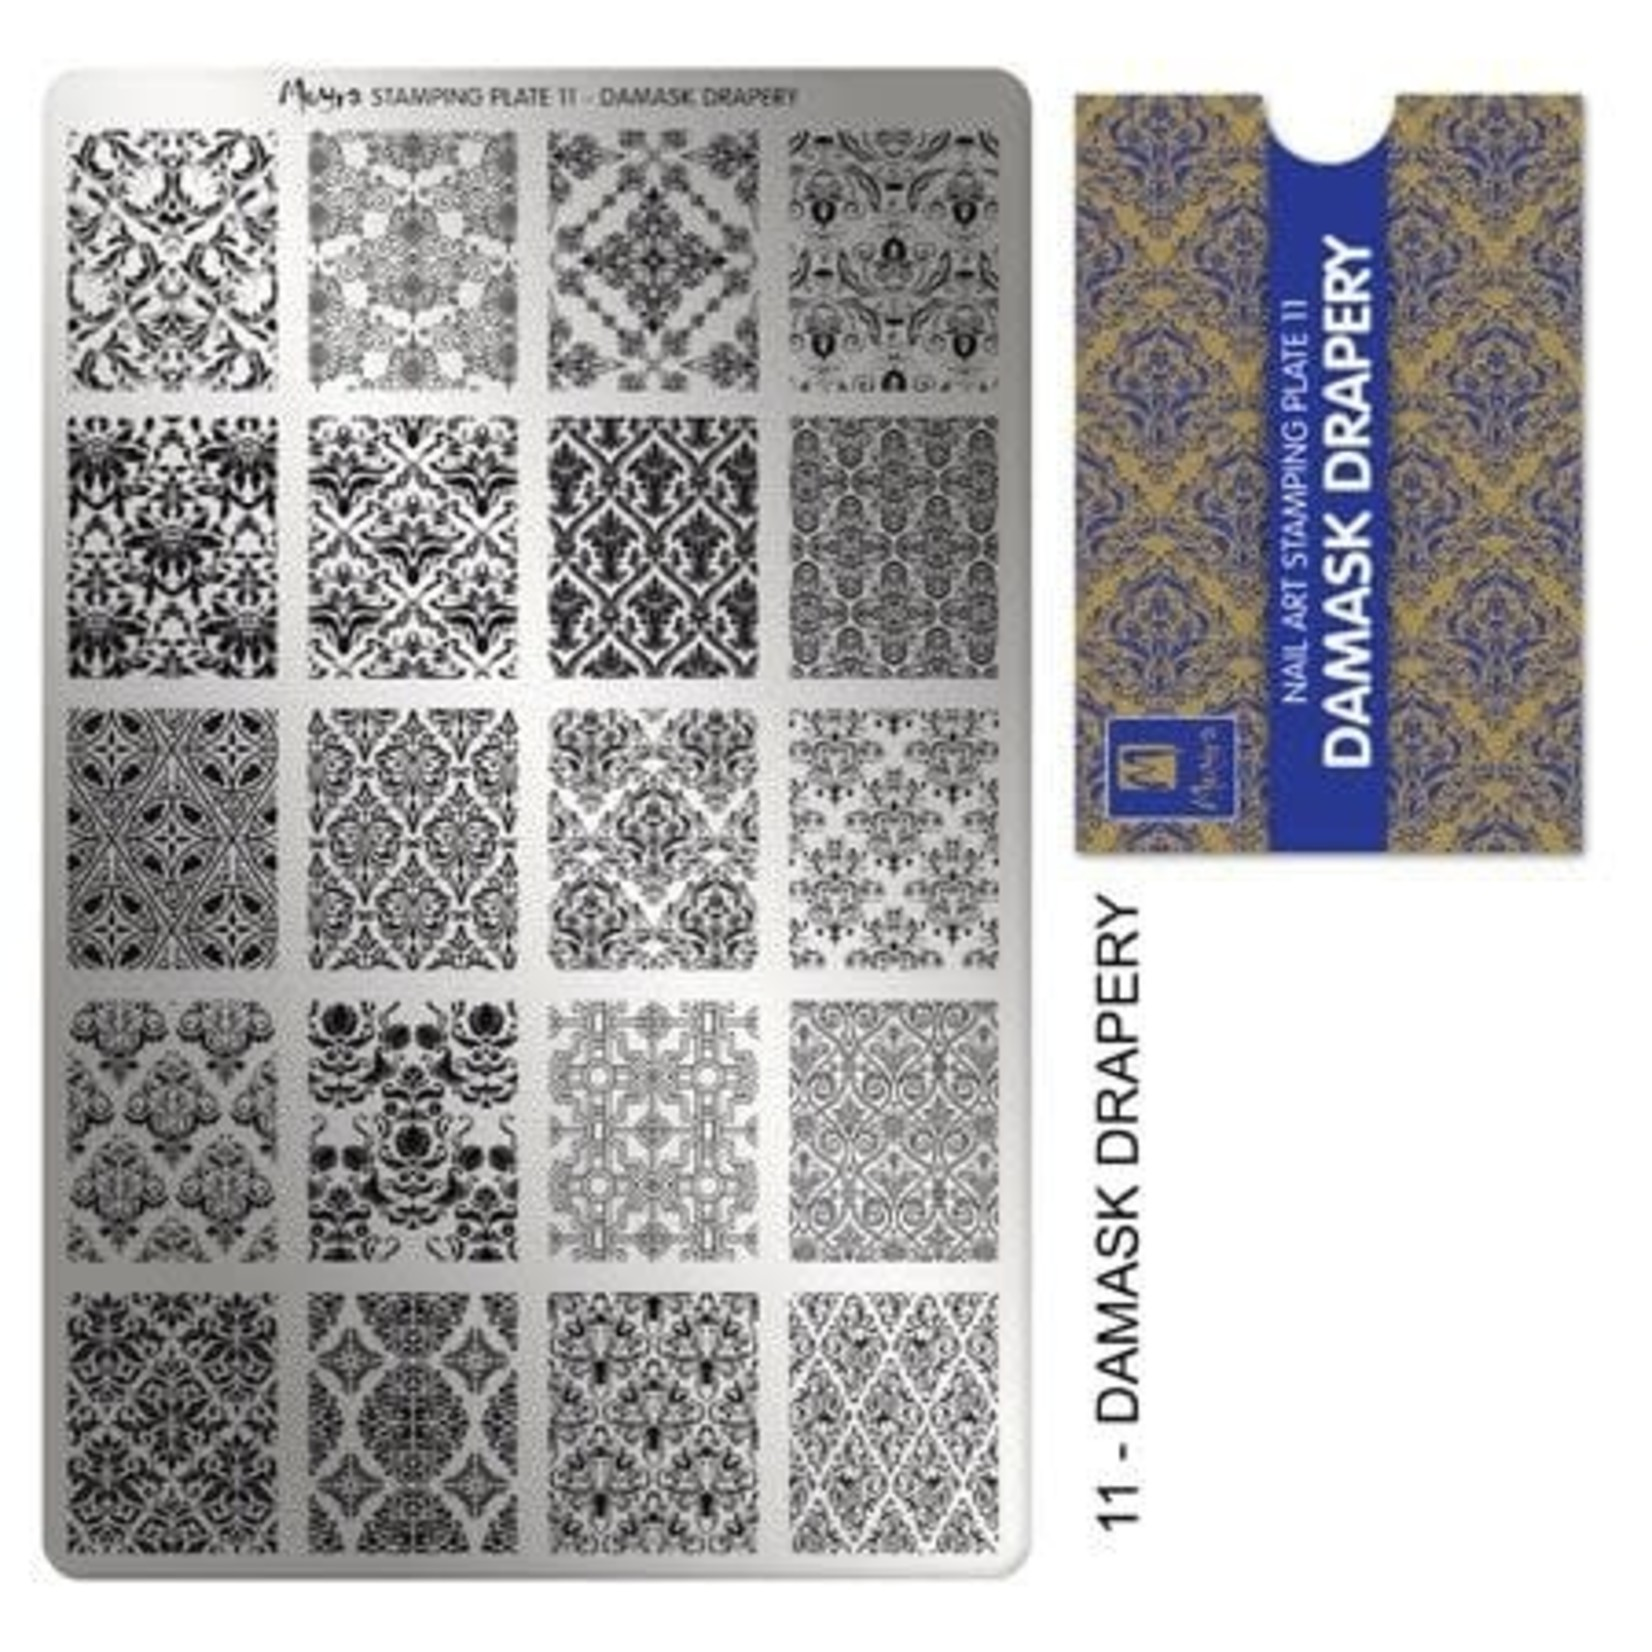 Moyra Moyra Stamping plate 11 Damask drapery